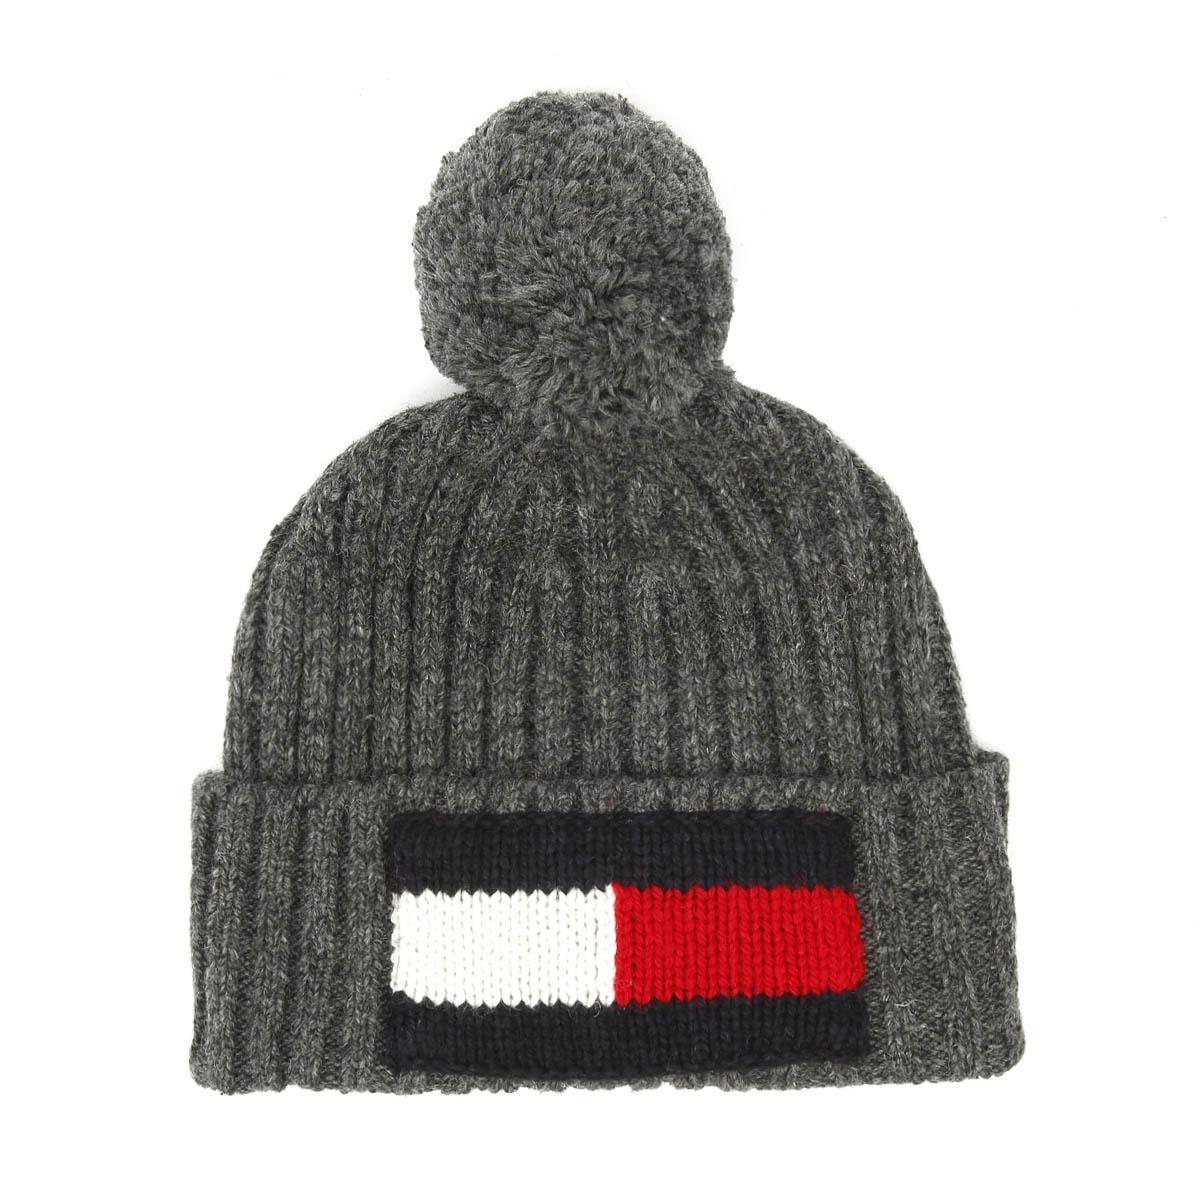 319b3eeac Tommy Hilfiger Big Flag Charcoal Grey Beanie Unisex Warm Winter Knitted Hat